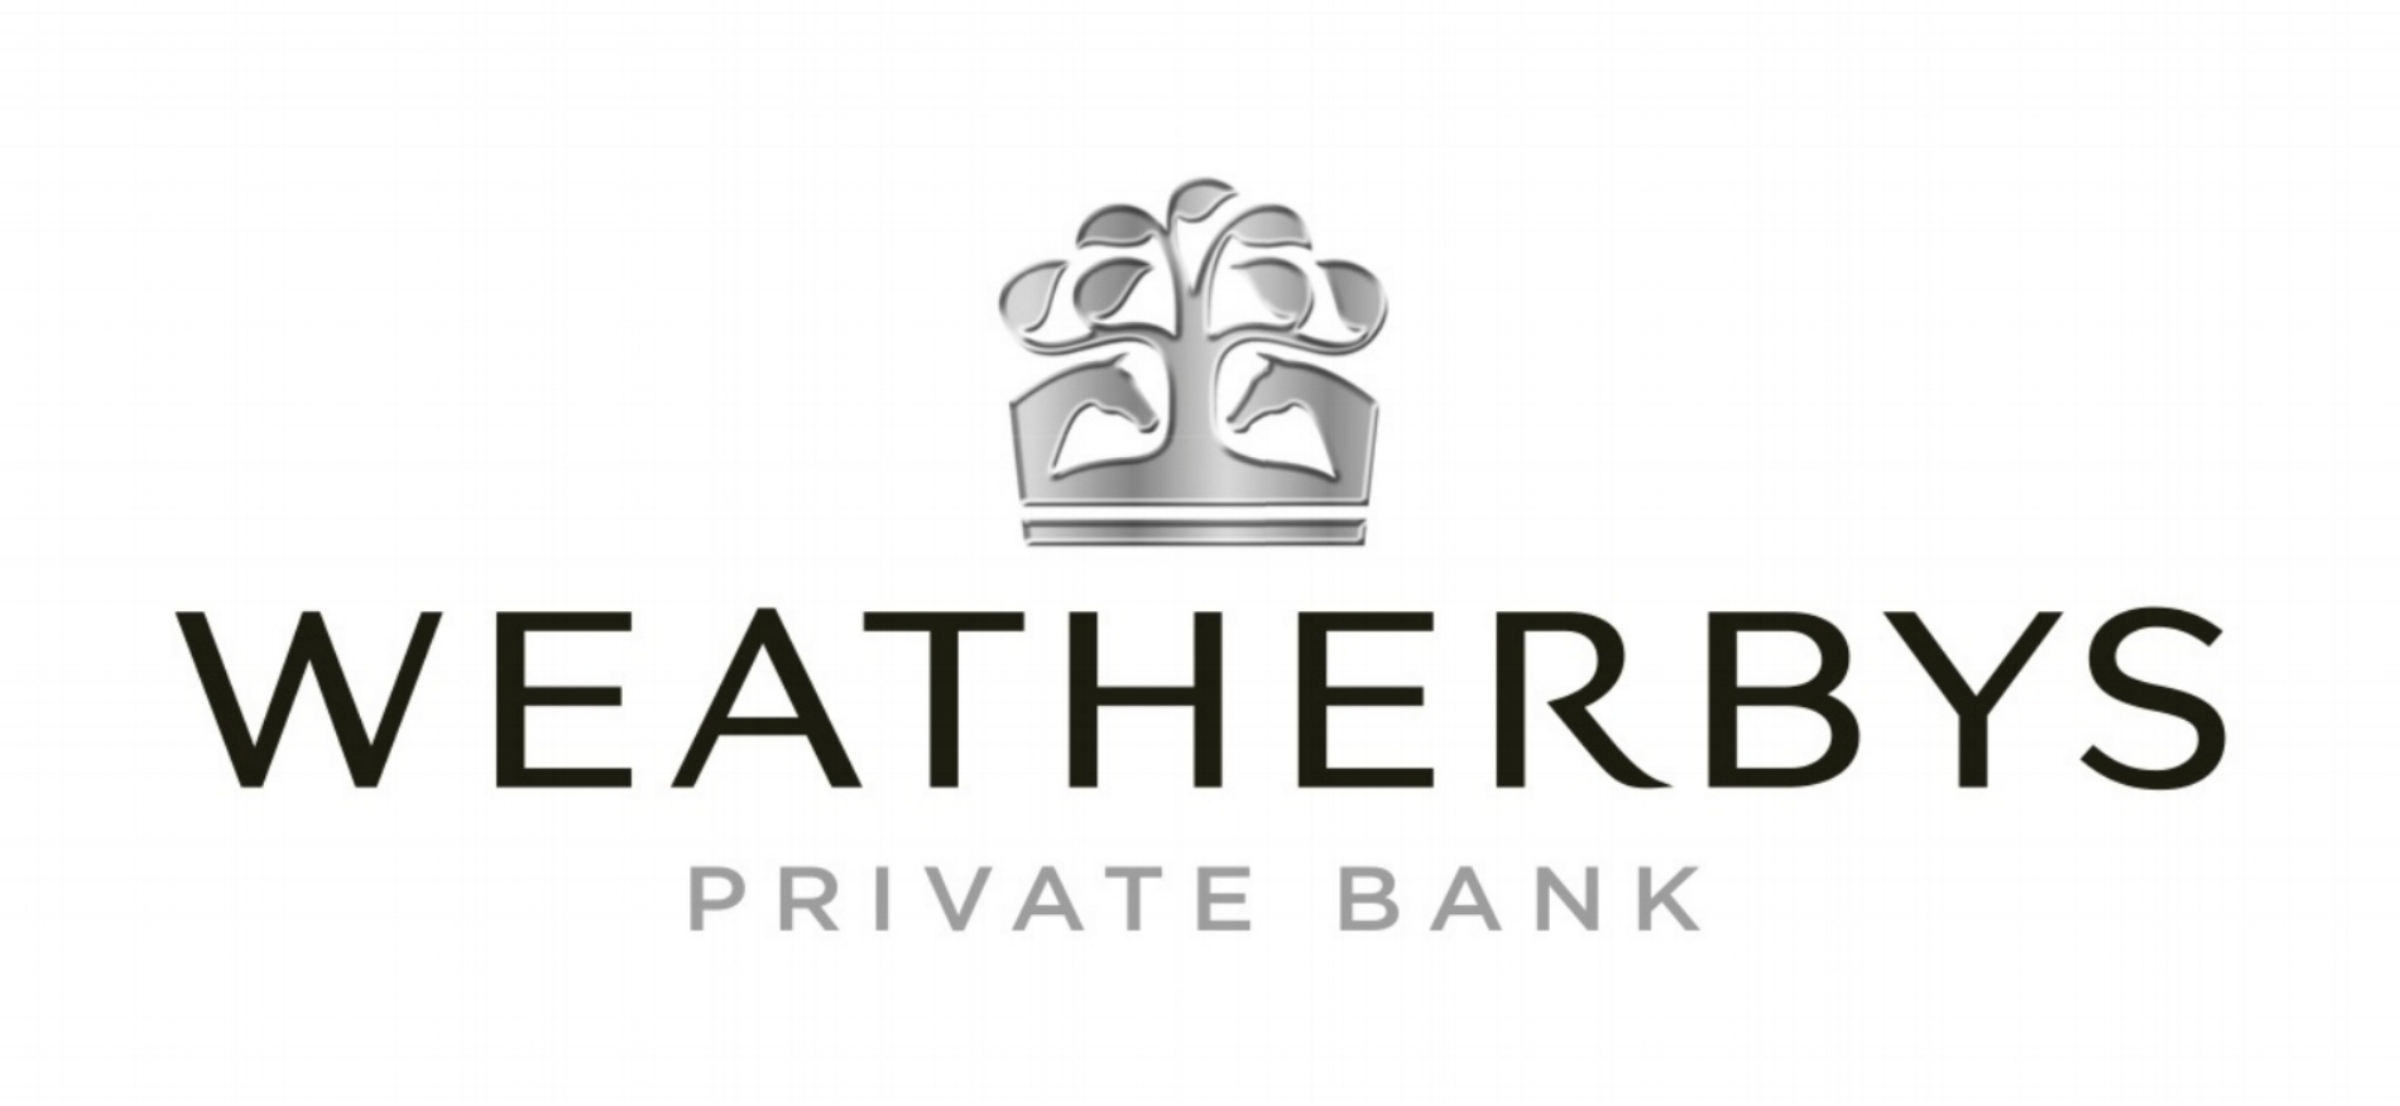 Weatherbys Logo.jpg